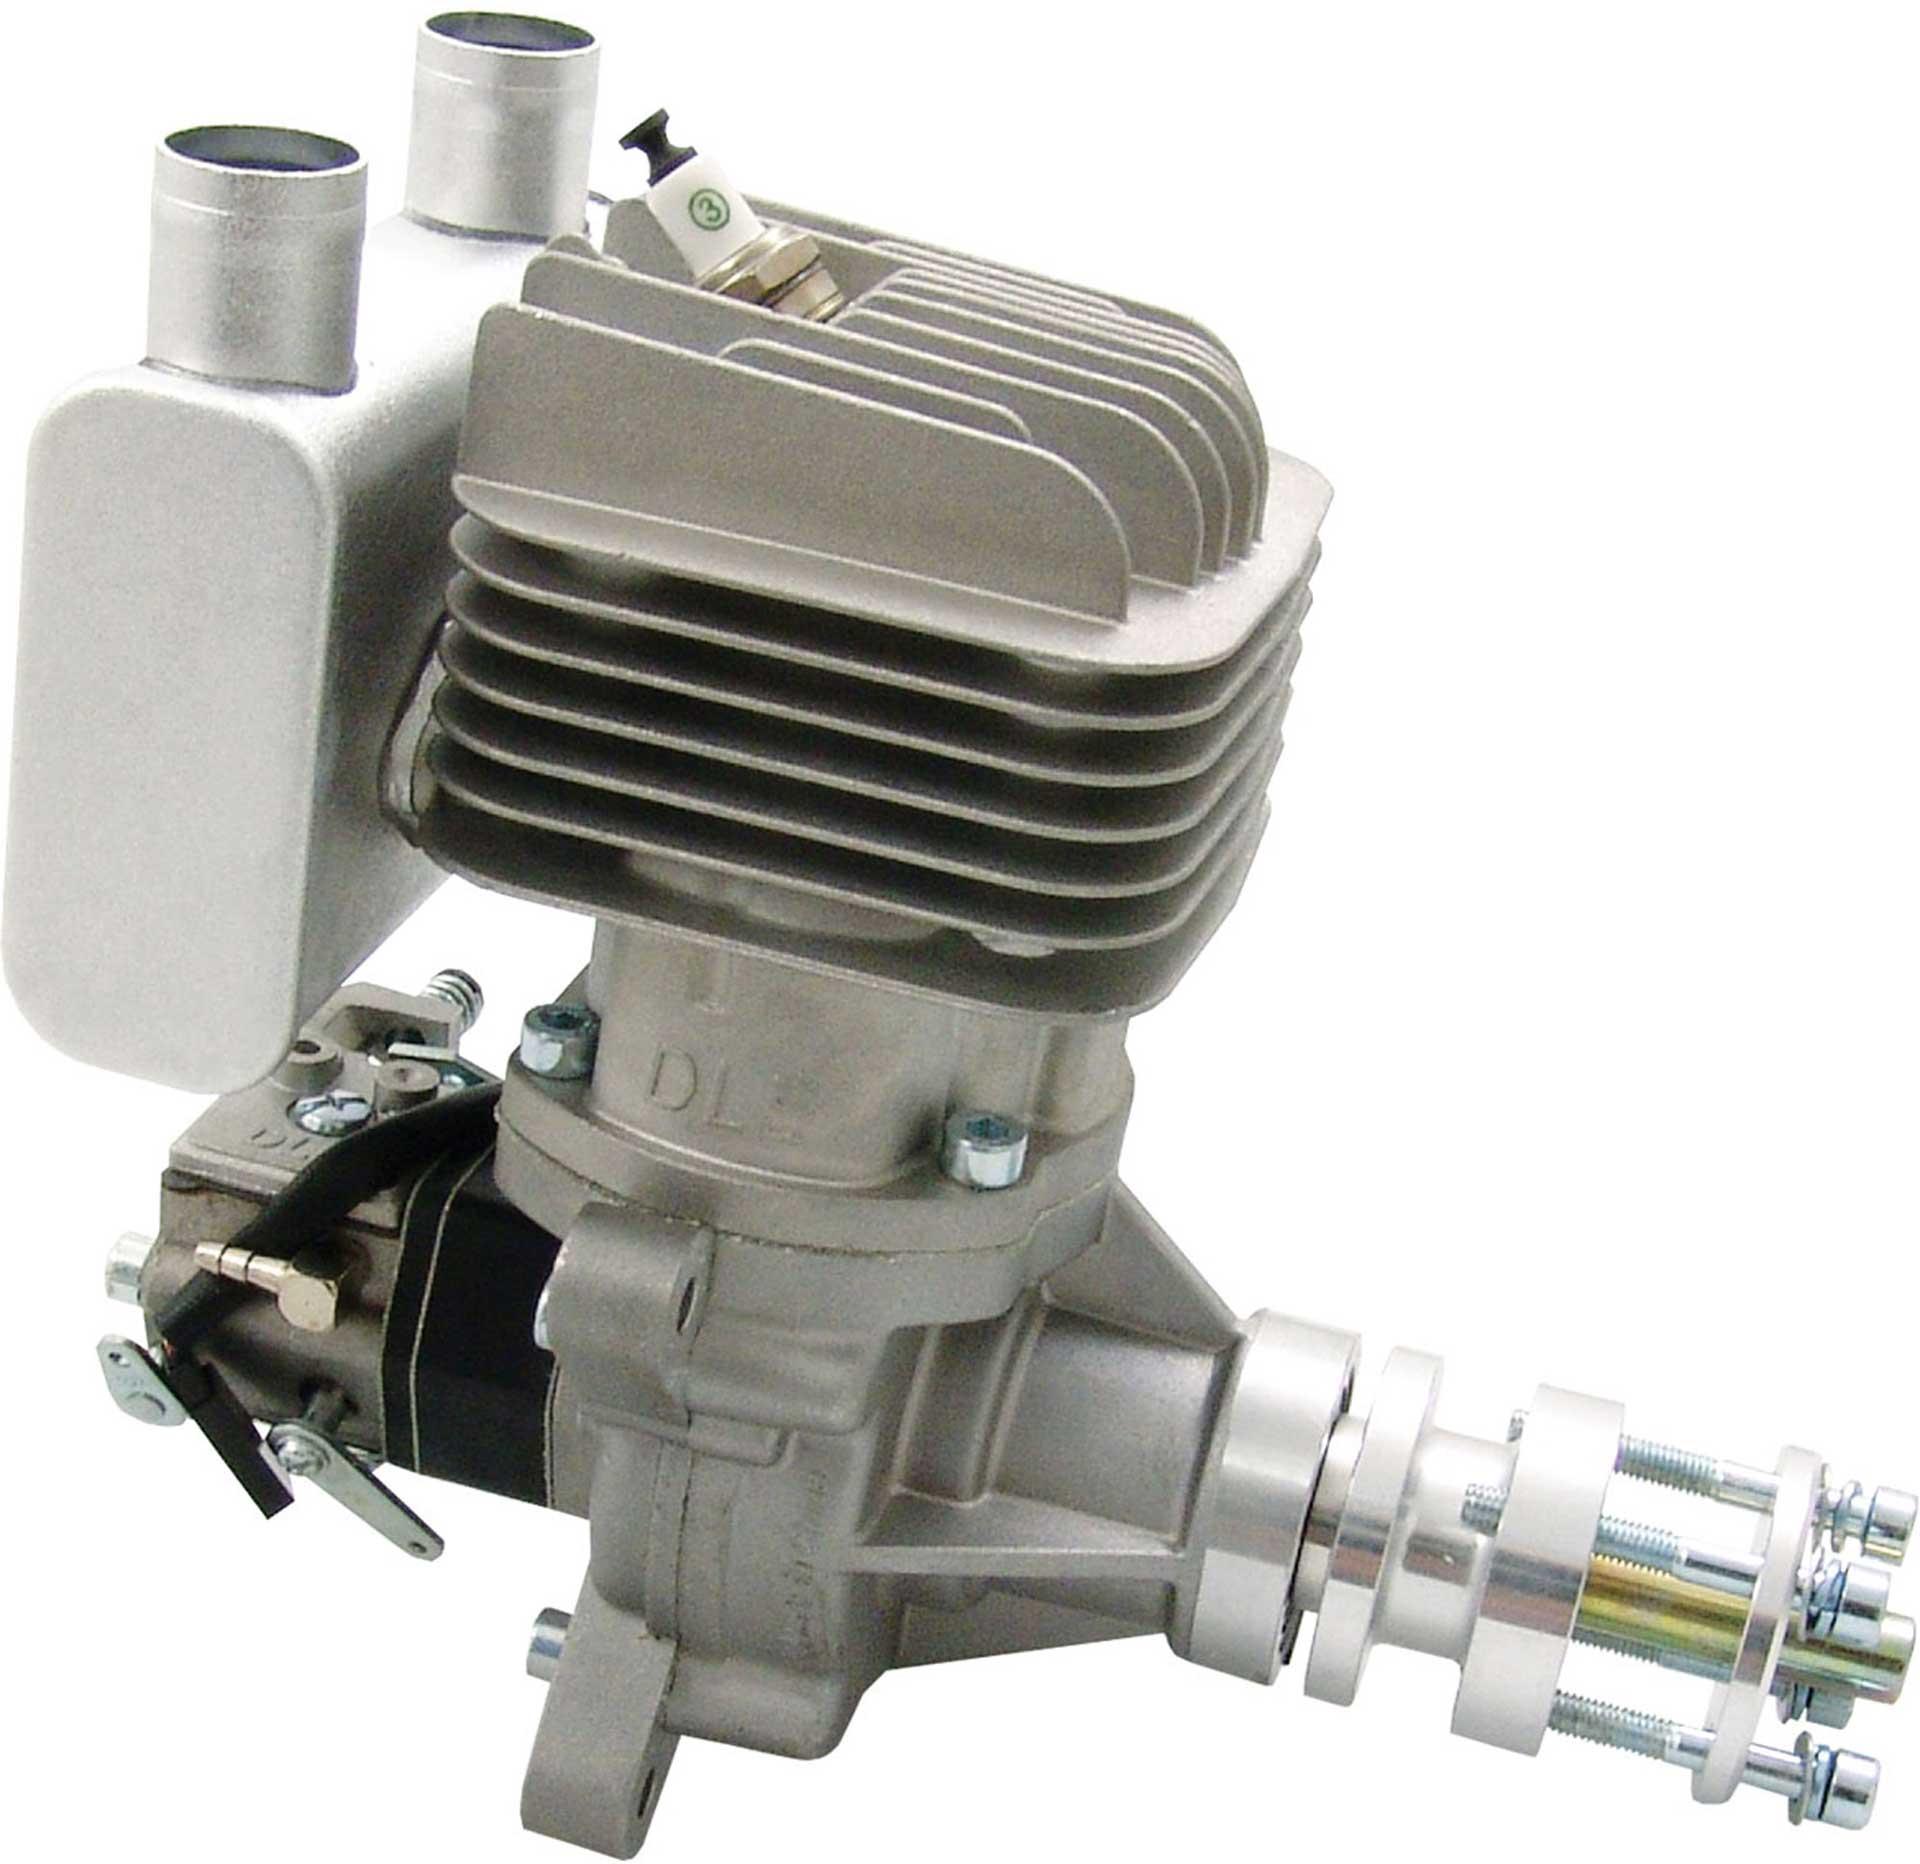 DLE Engines DLE 55 RA BENZIN MOTOR HECKAUSLASS